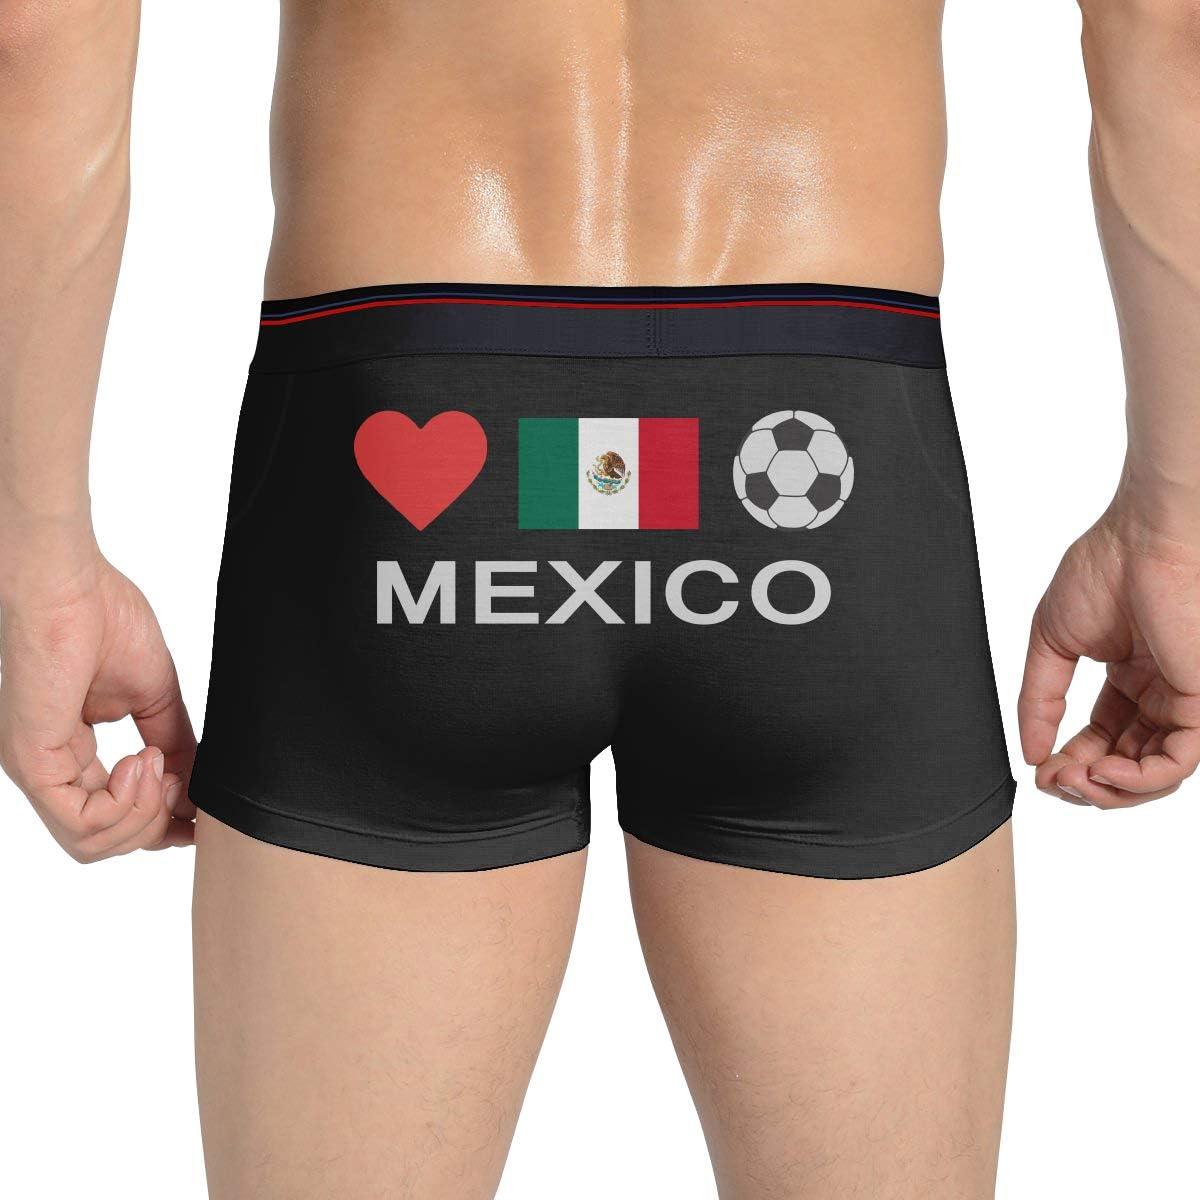 BUNO9H4 Make America Mexico Again Mens Cotton Underwear Shorts Underpants Briefs Underpants